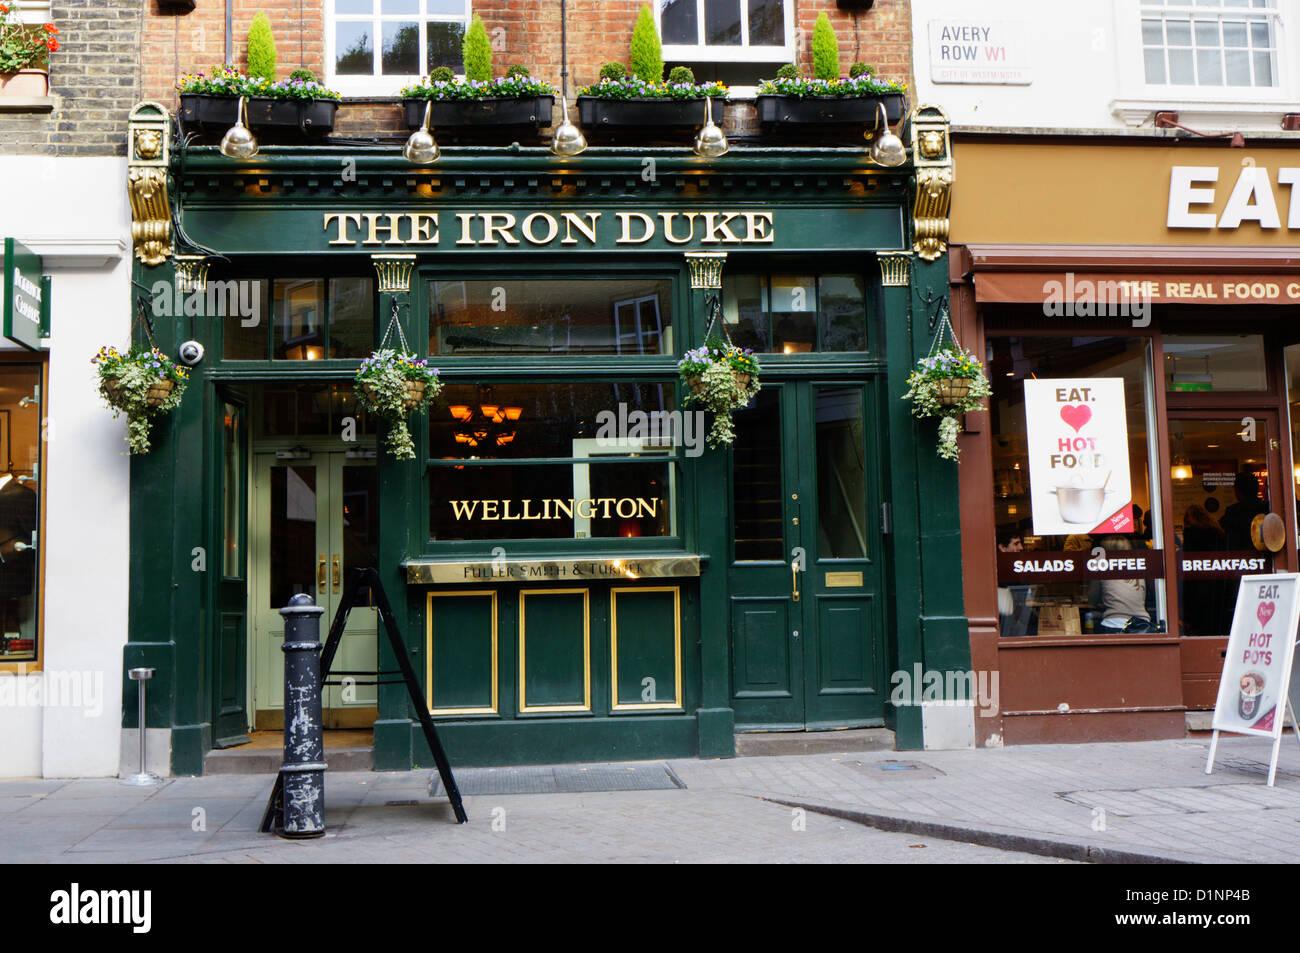 The Iron Duke public house in Avery Row, Mayfair, London. - Stock Image